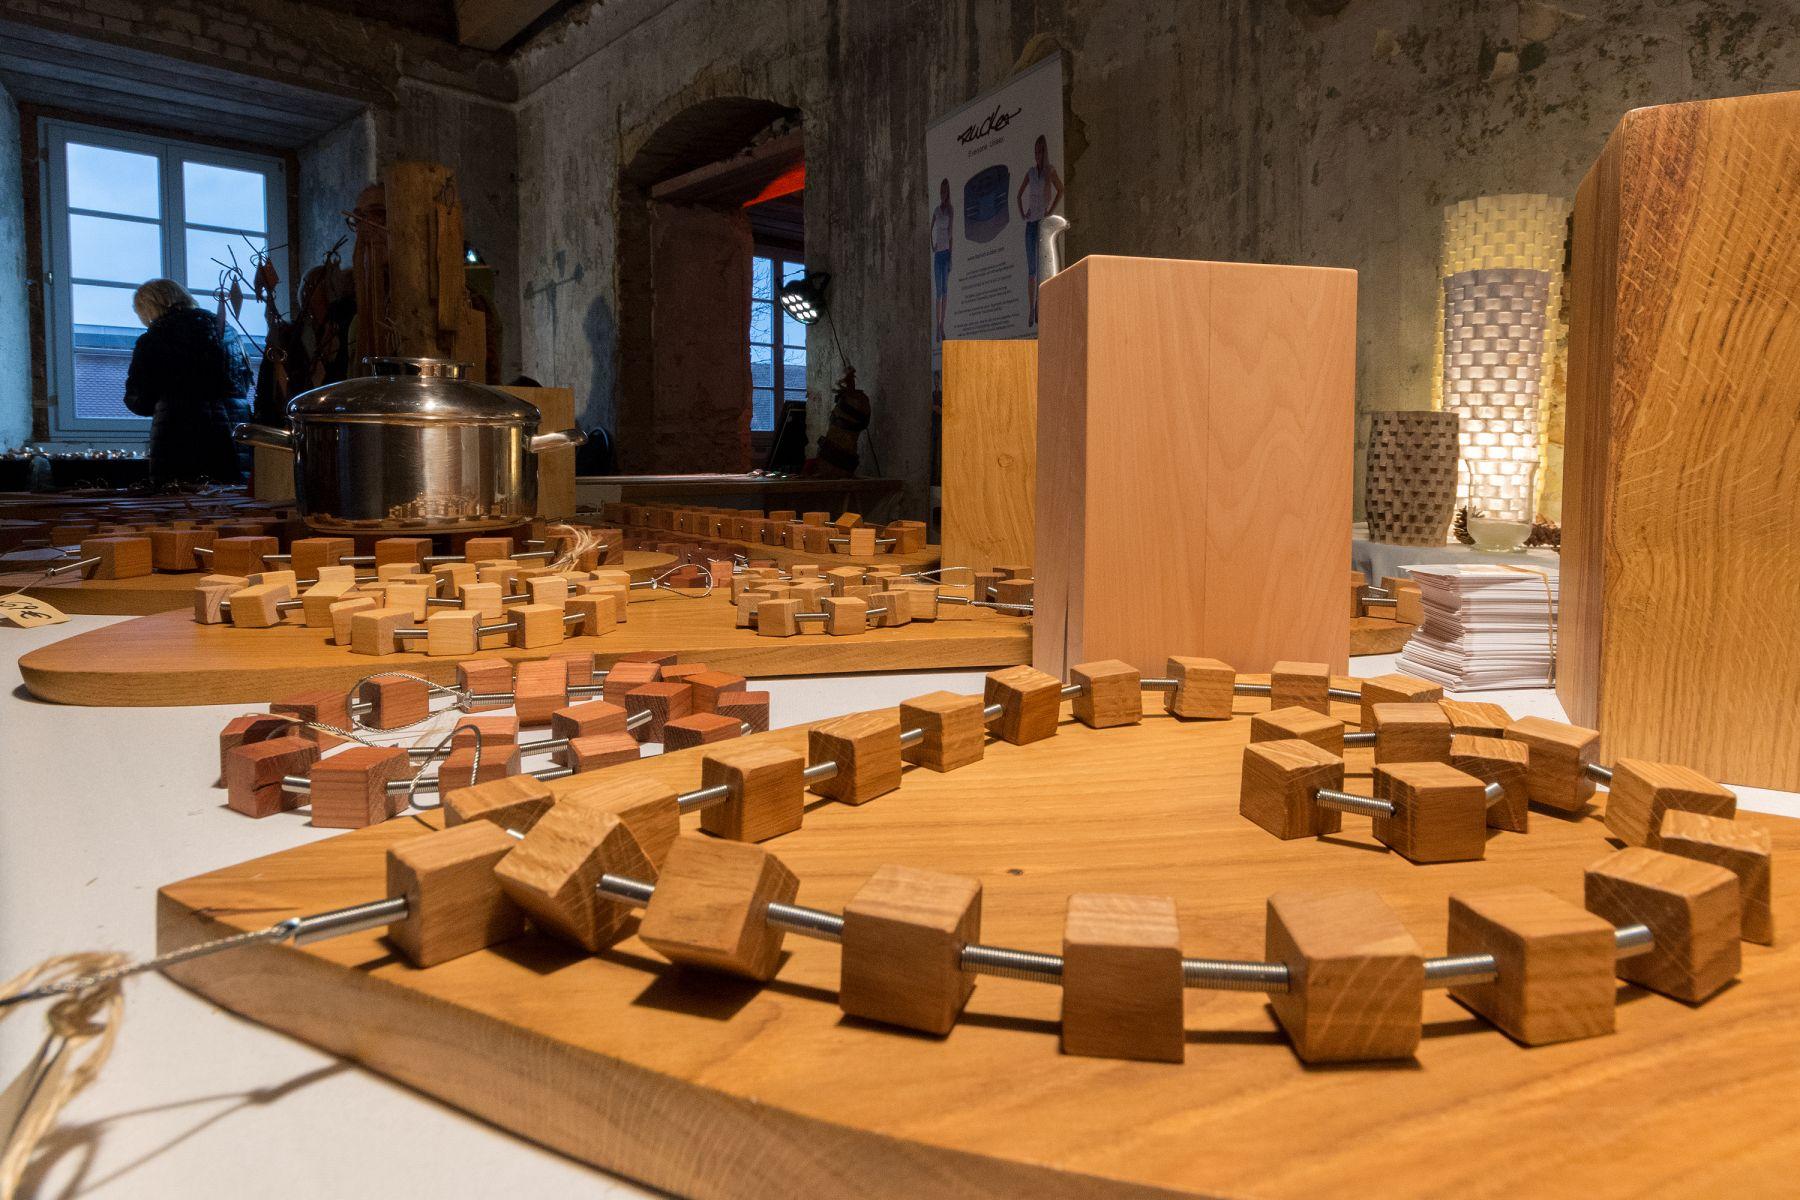 Martini-Ausstellung 2017 im Schloss Pirkensee